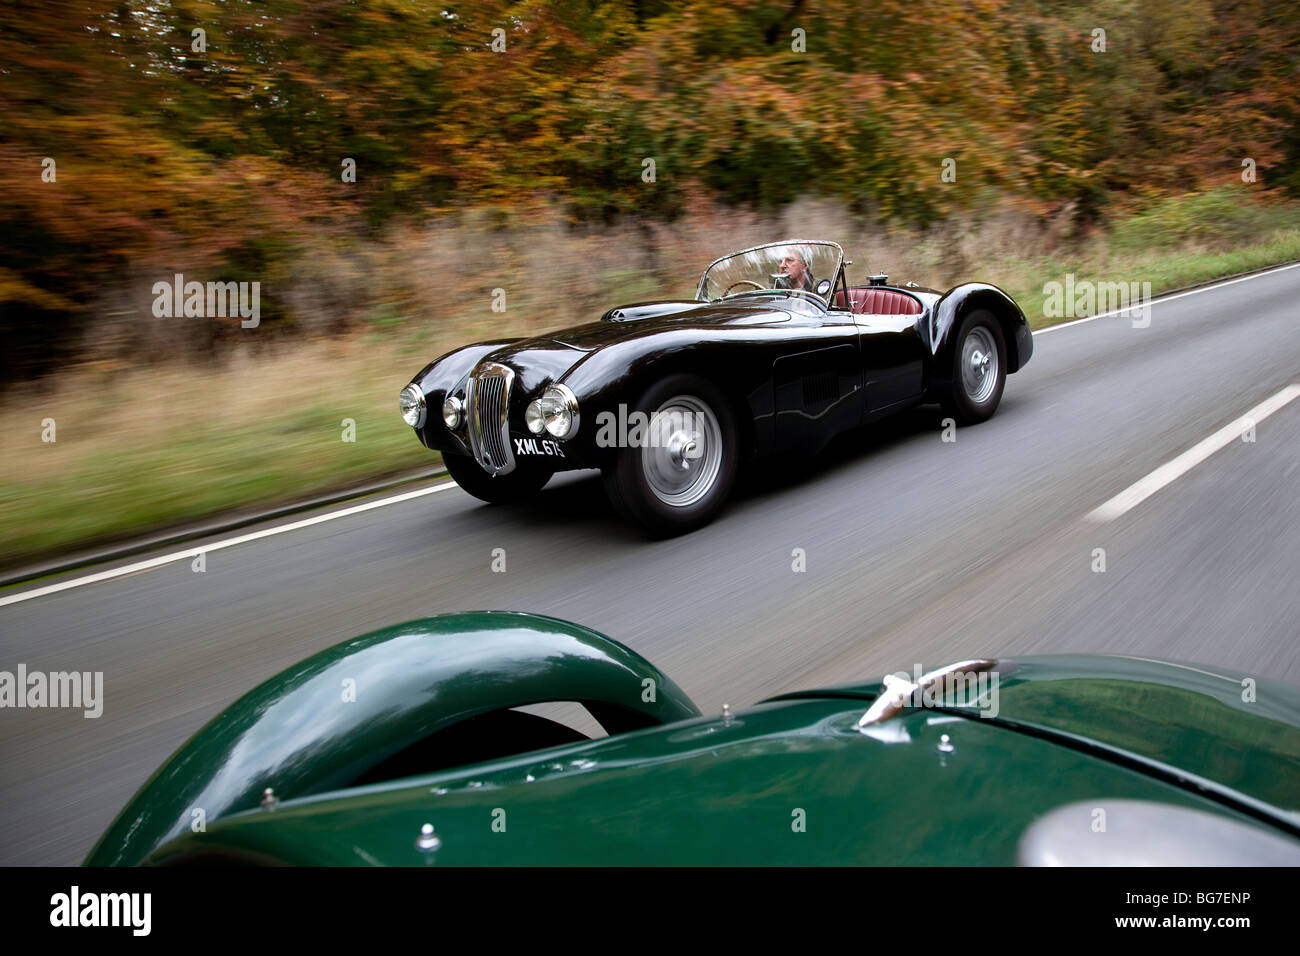 Frazer -Nash Mille Miglia 1952 - Stock Image